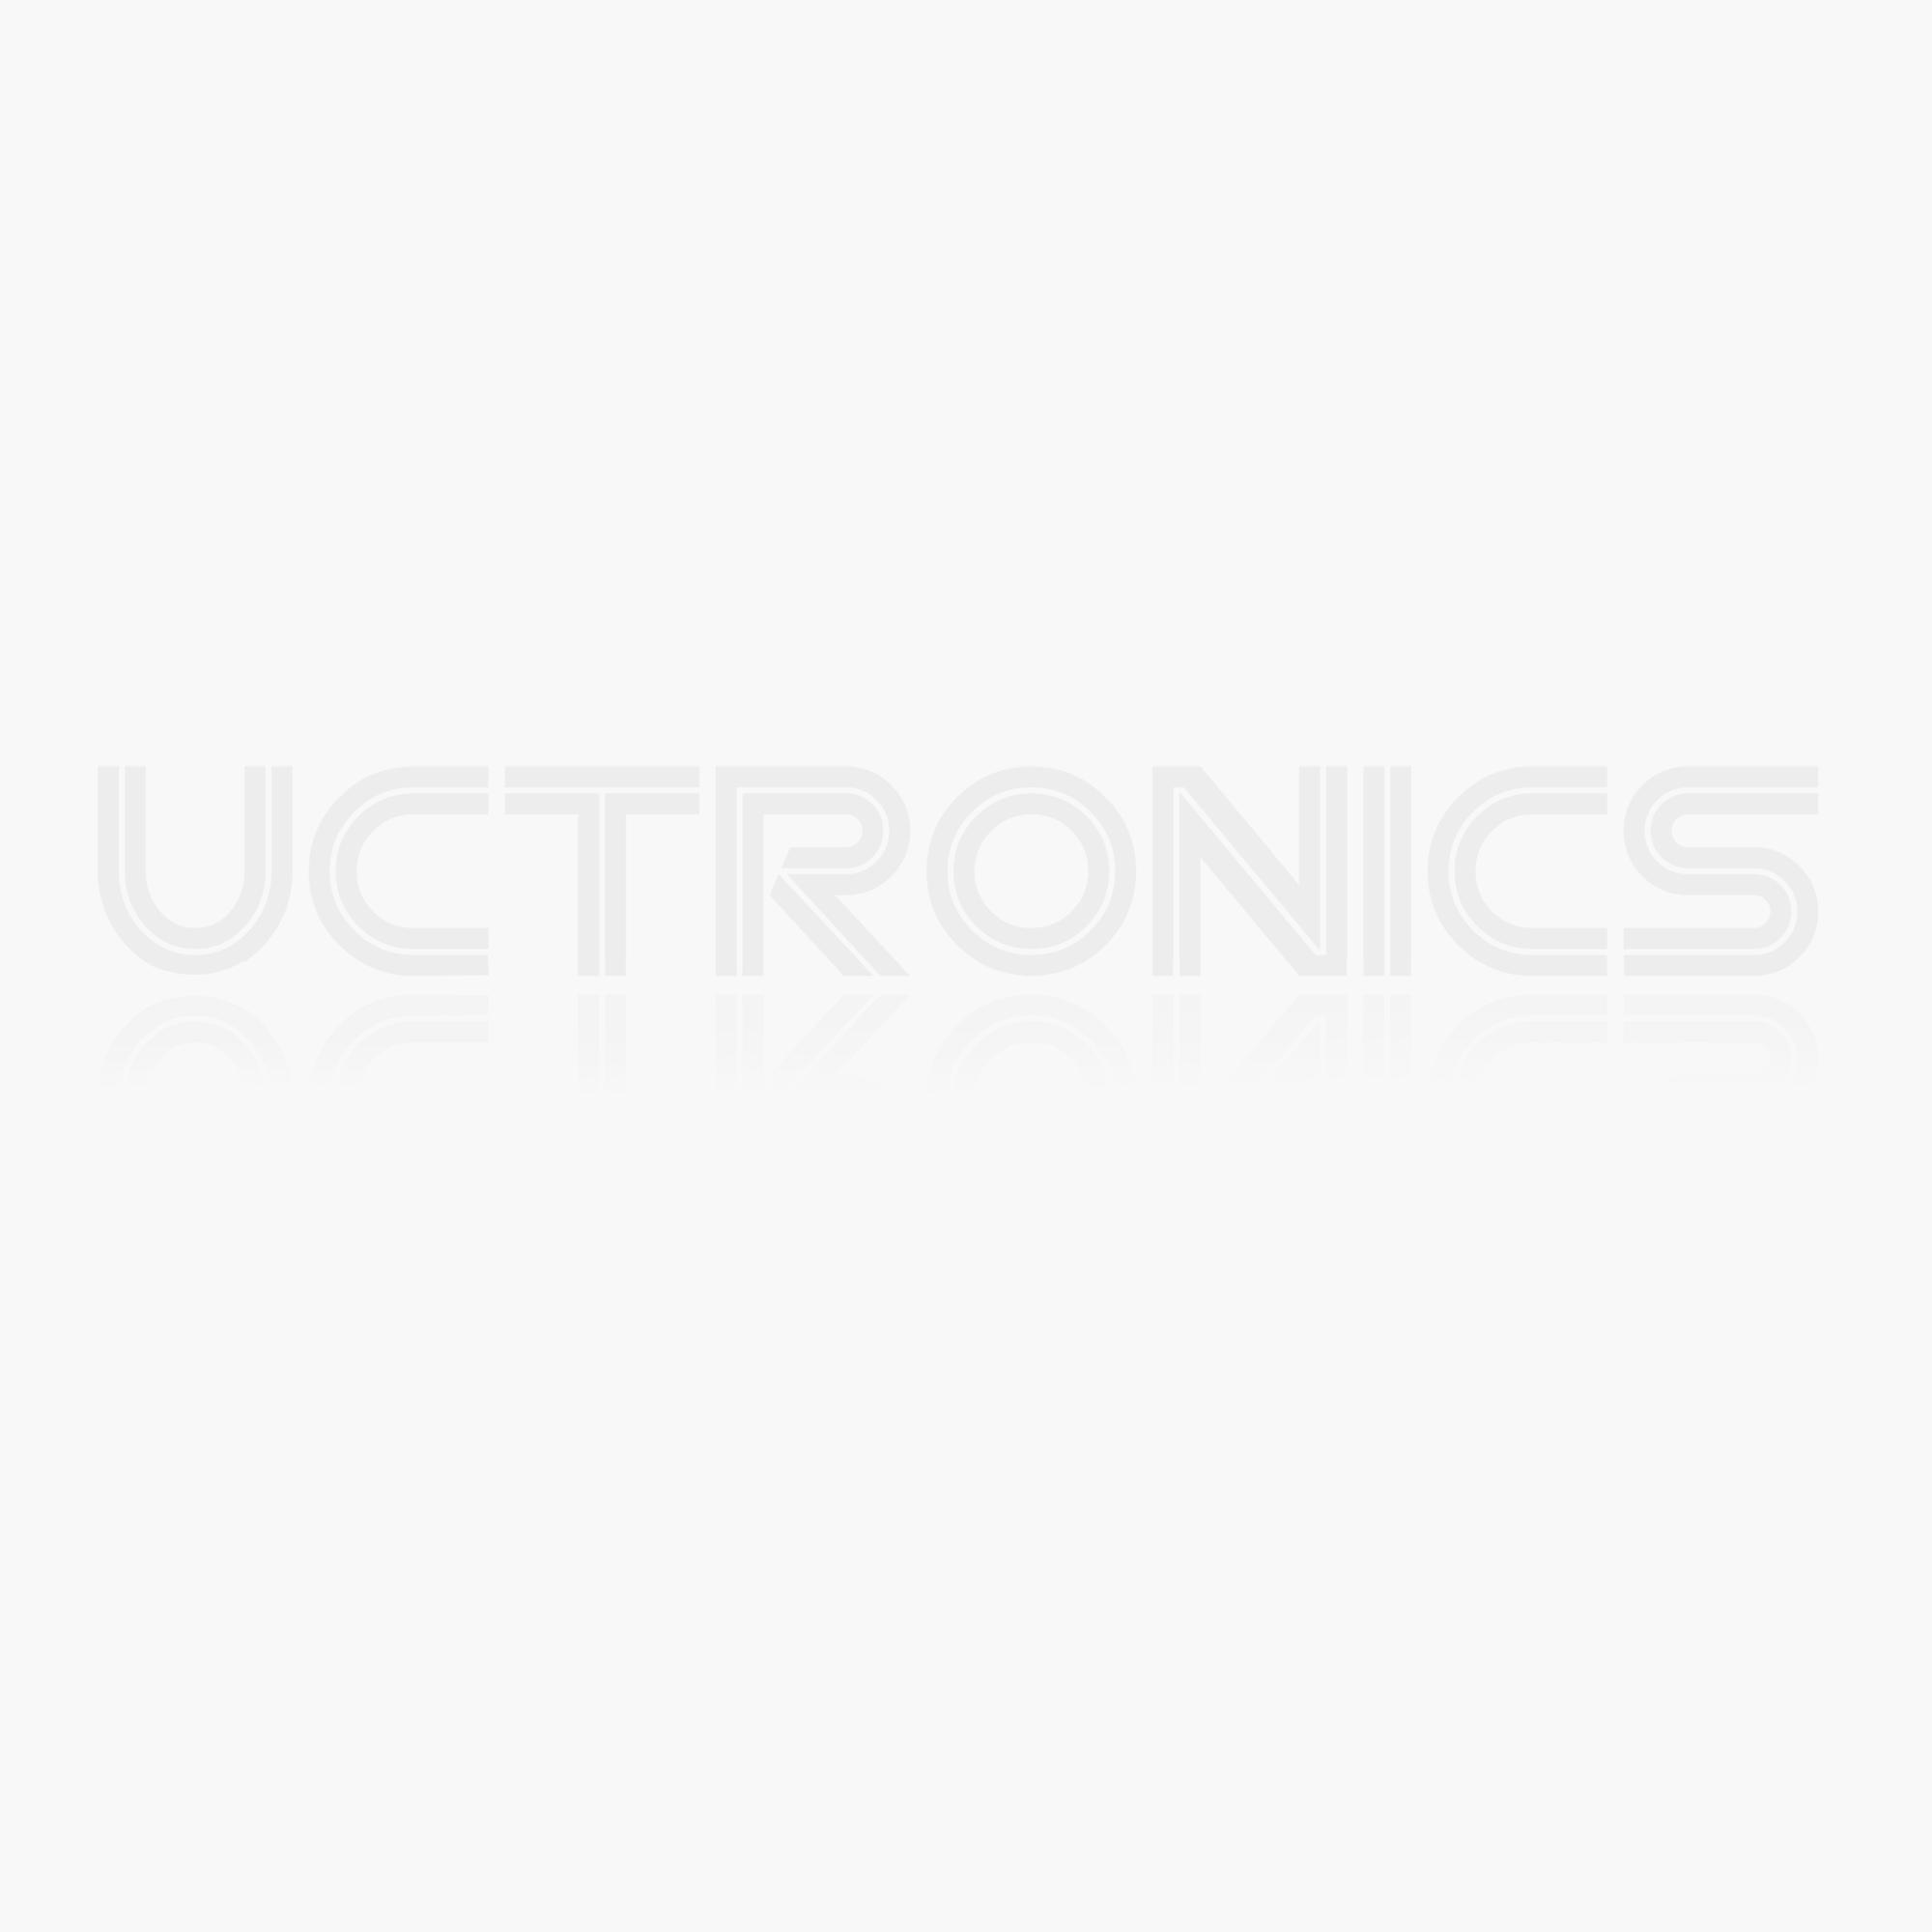 Arduino MAX7219 8x8 Lattice Display Module DIY Kits